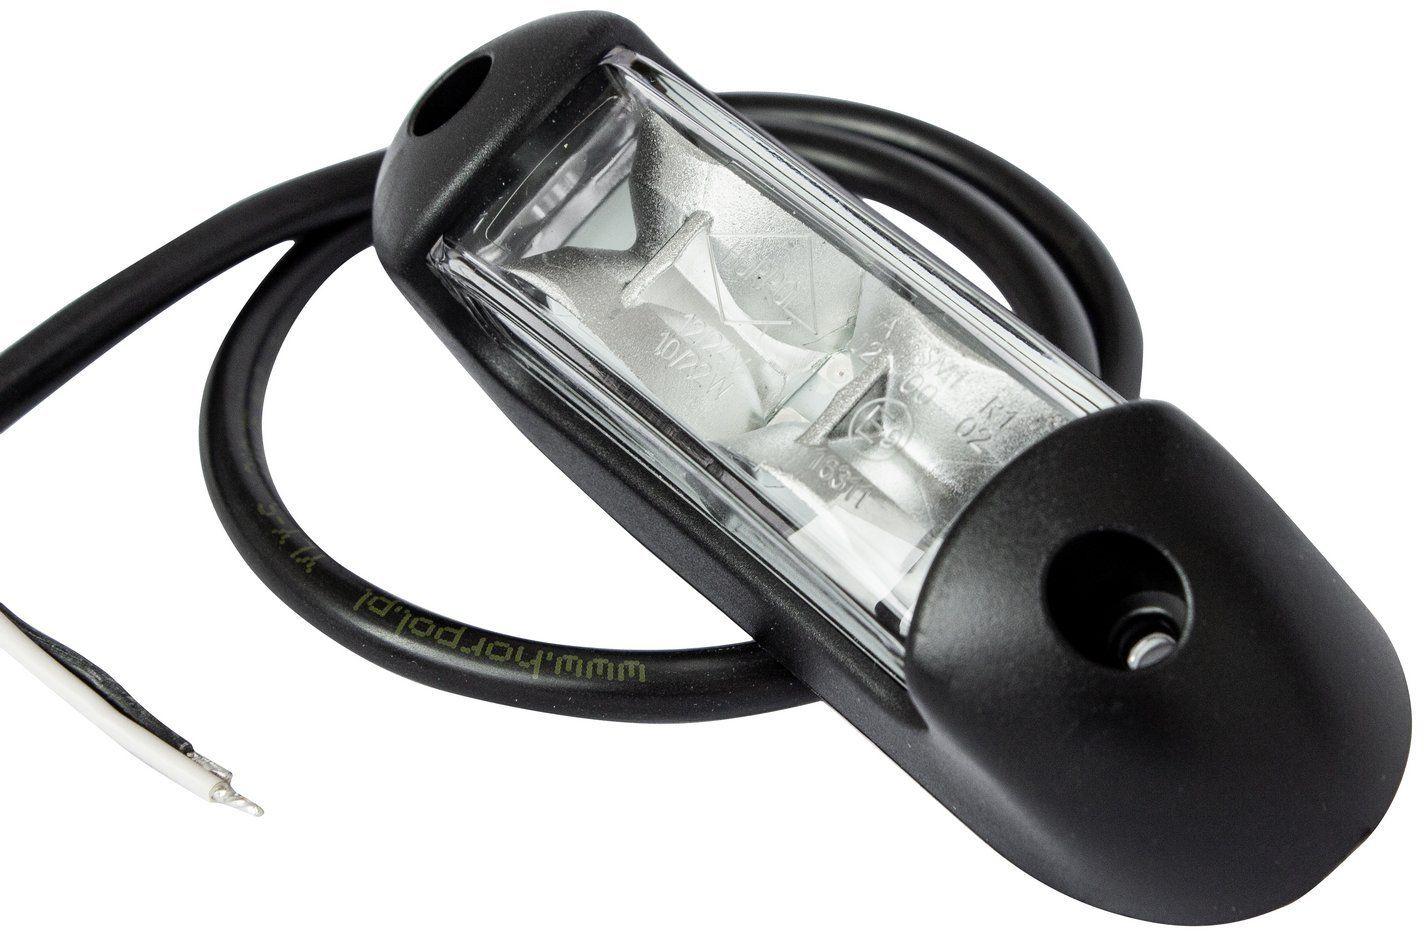 Lampa obrysowa potrójna LED Horpol LD 2166